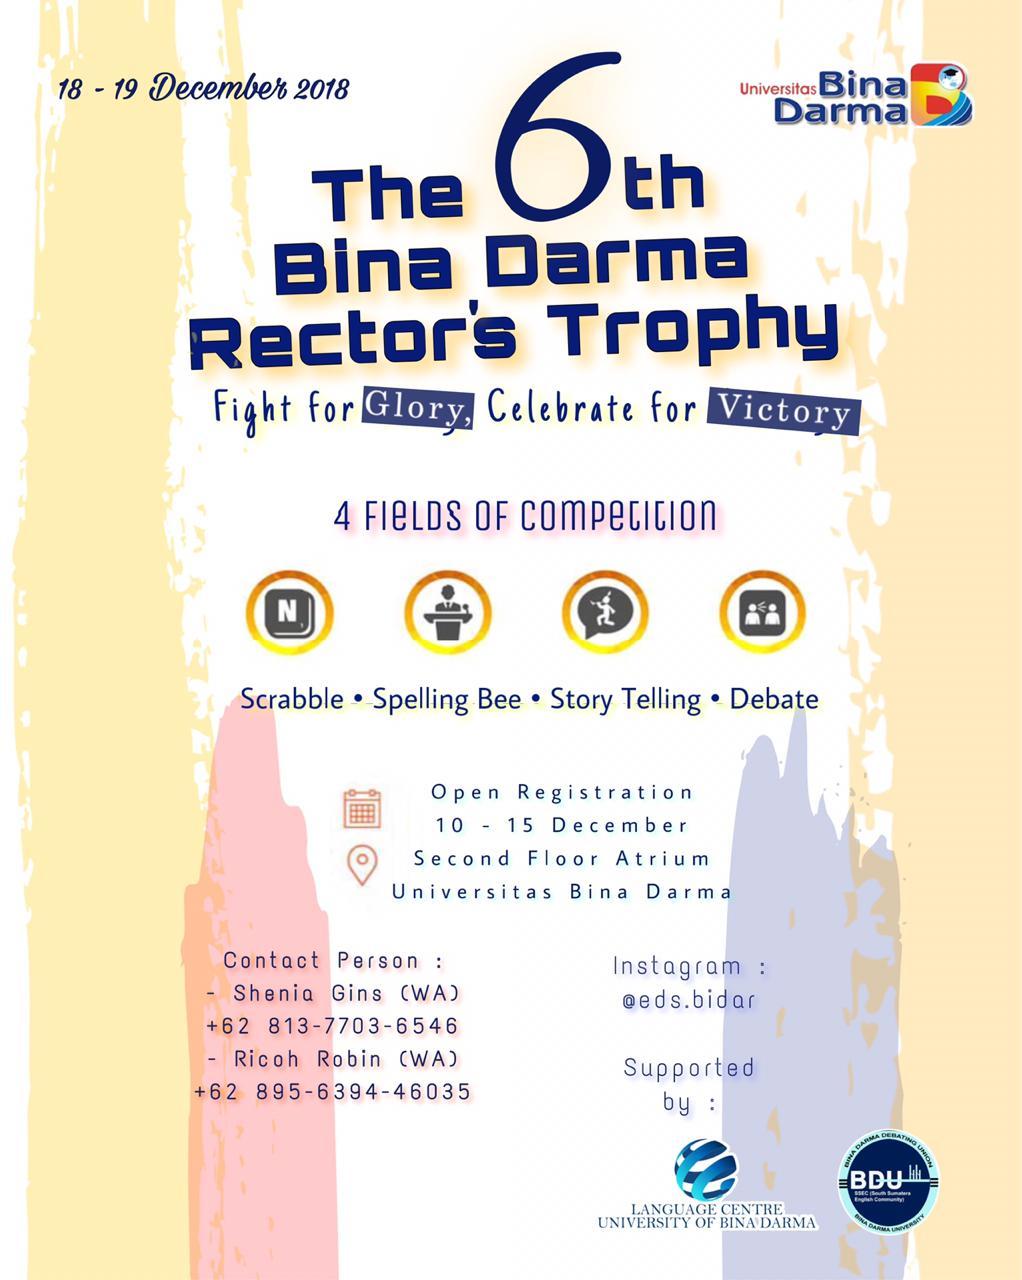 Bina Darma Rector's Trophy 2018